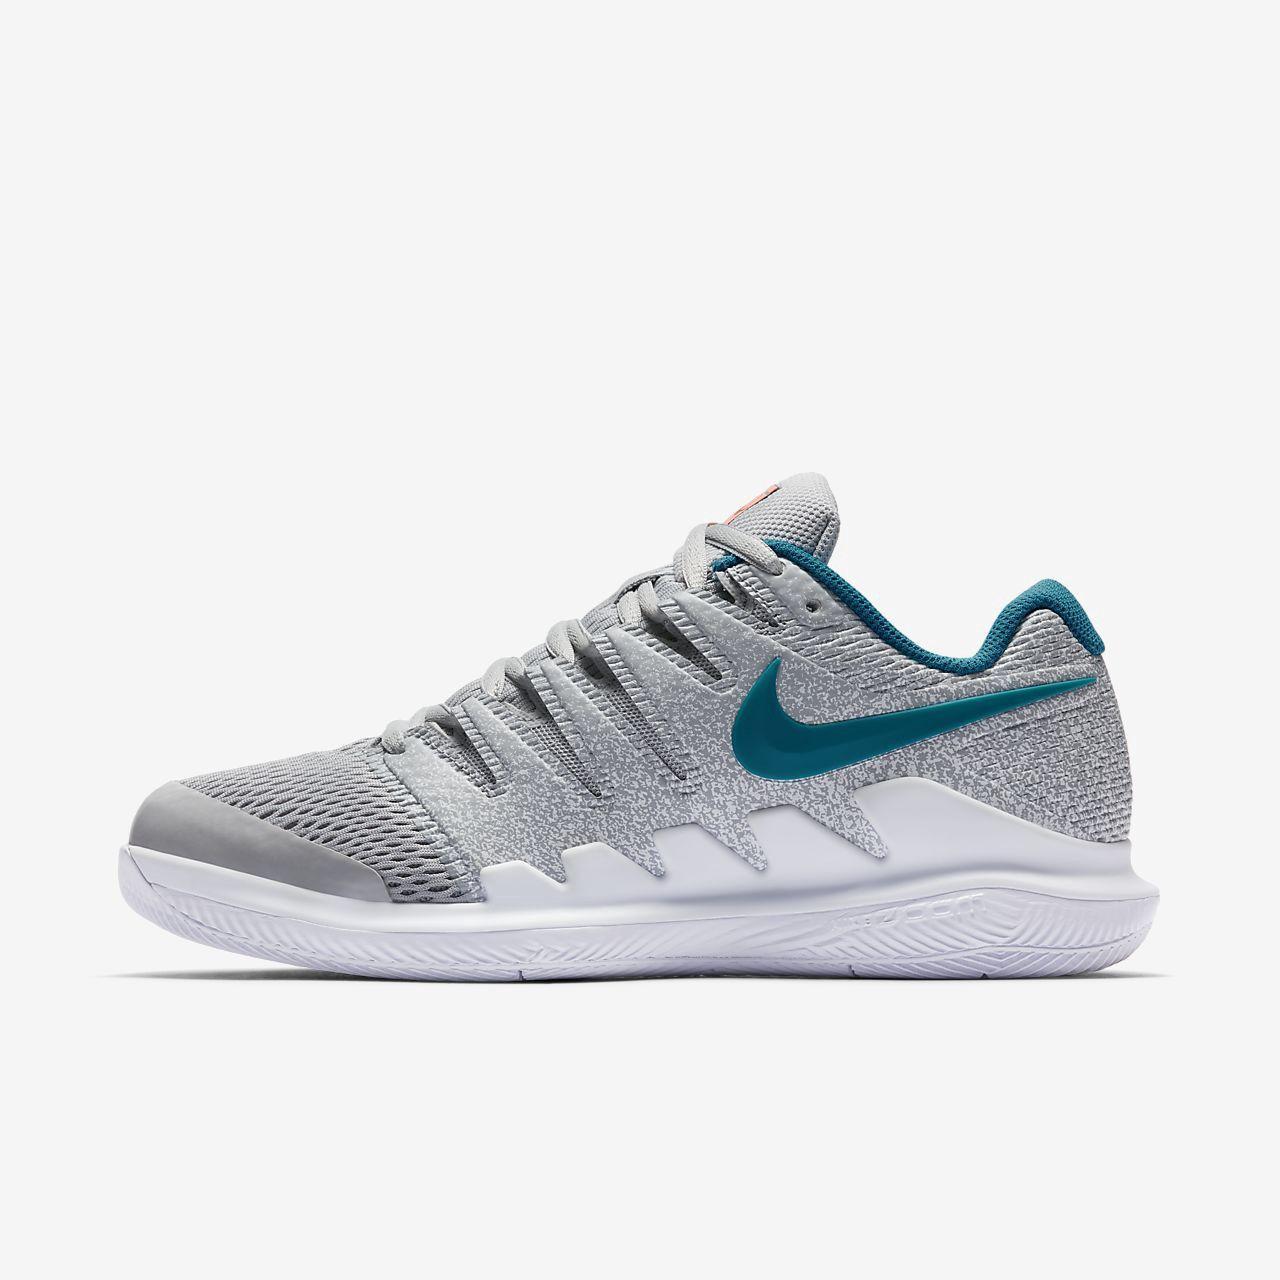 pretty nice a1402 11d68 Nike Air Zoom Vapor X Hc Women s Tennis Shoe - 11.5